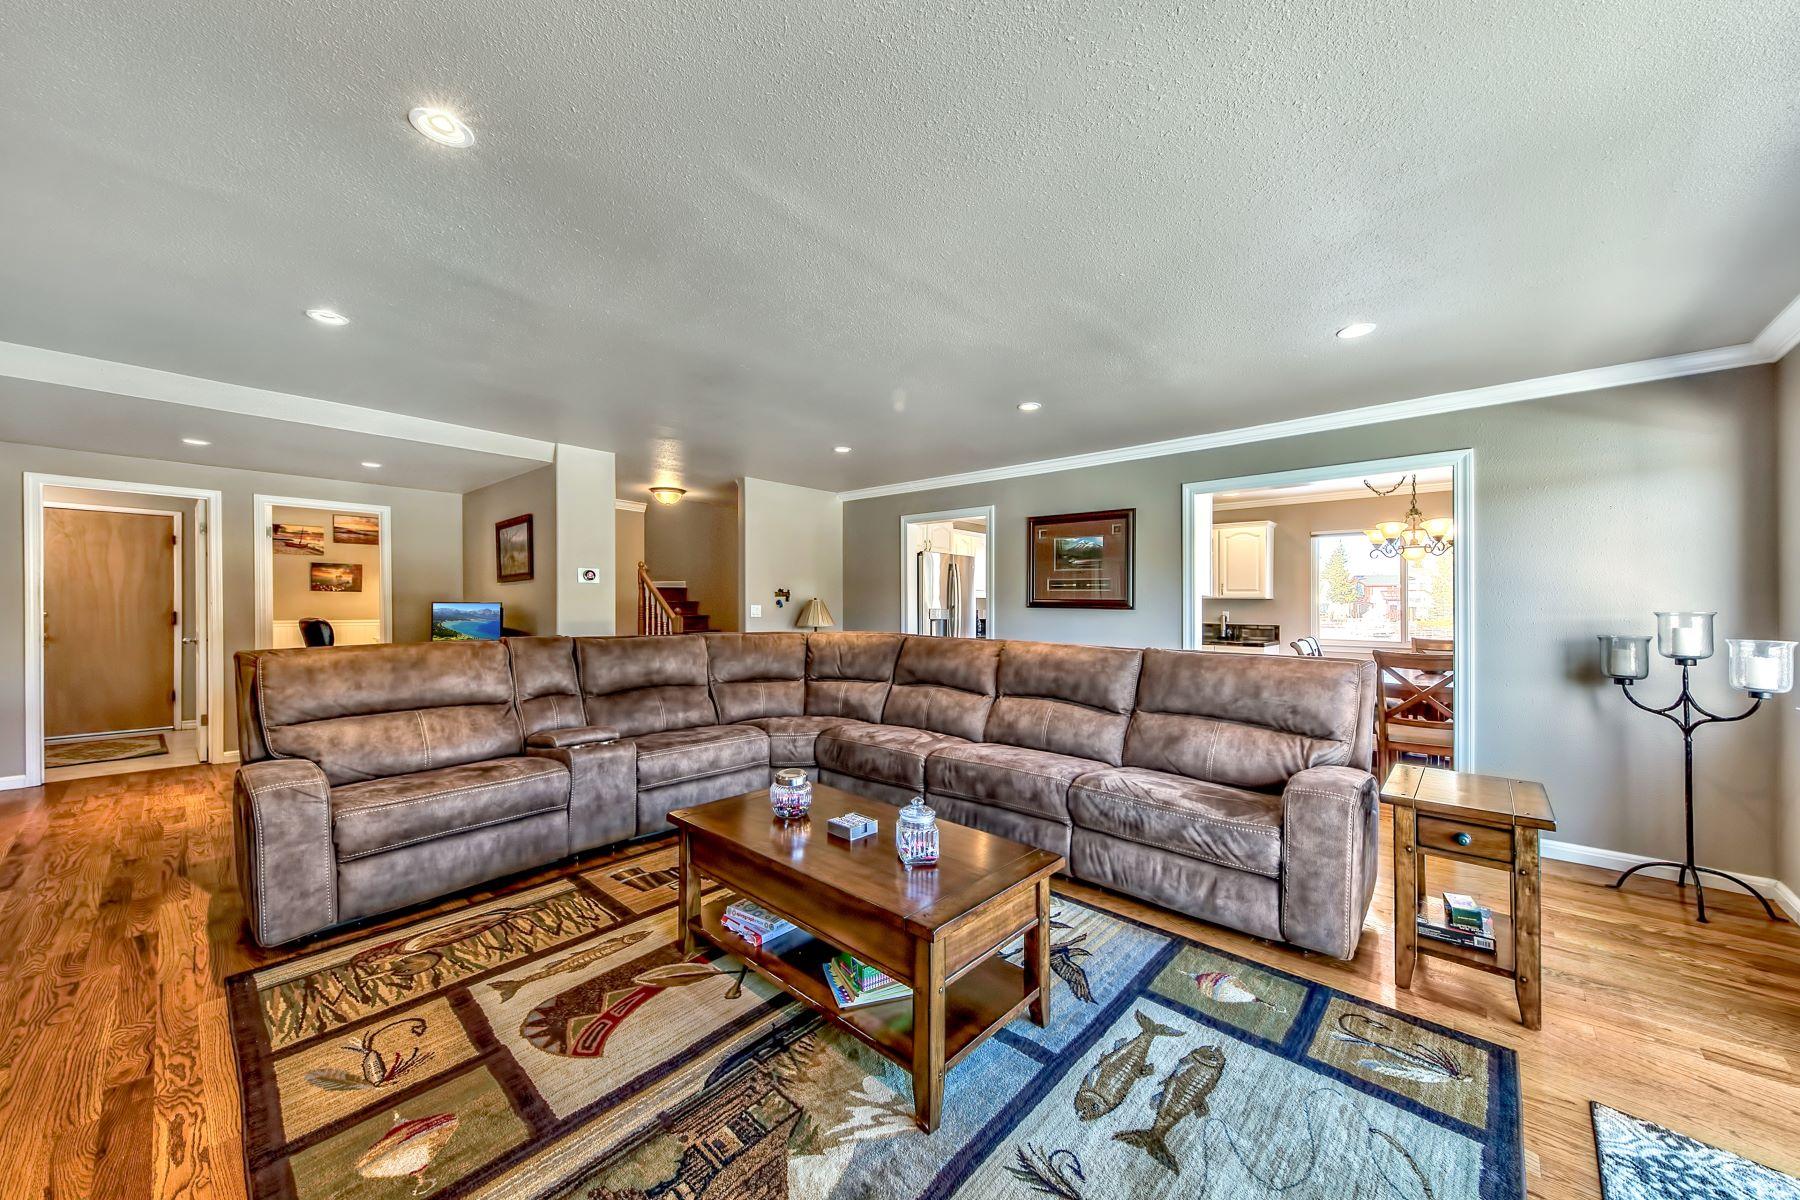 Additional photo for property listing at 2030 Garmish Ct,South Lake Tahoe, CA 96150 2030 Garmish Court South Lake Tahoe, California 96150 United States